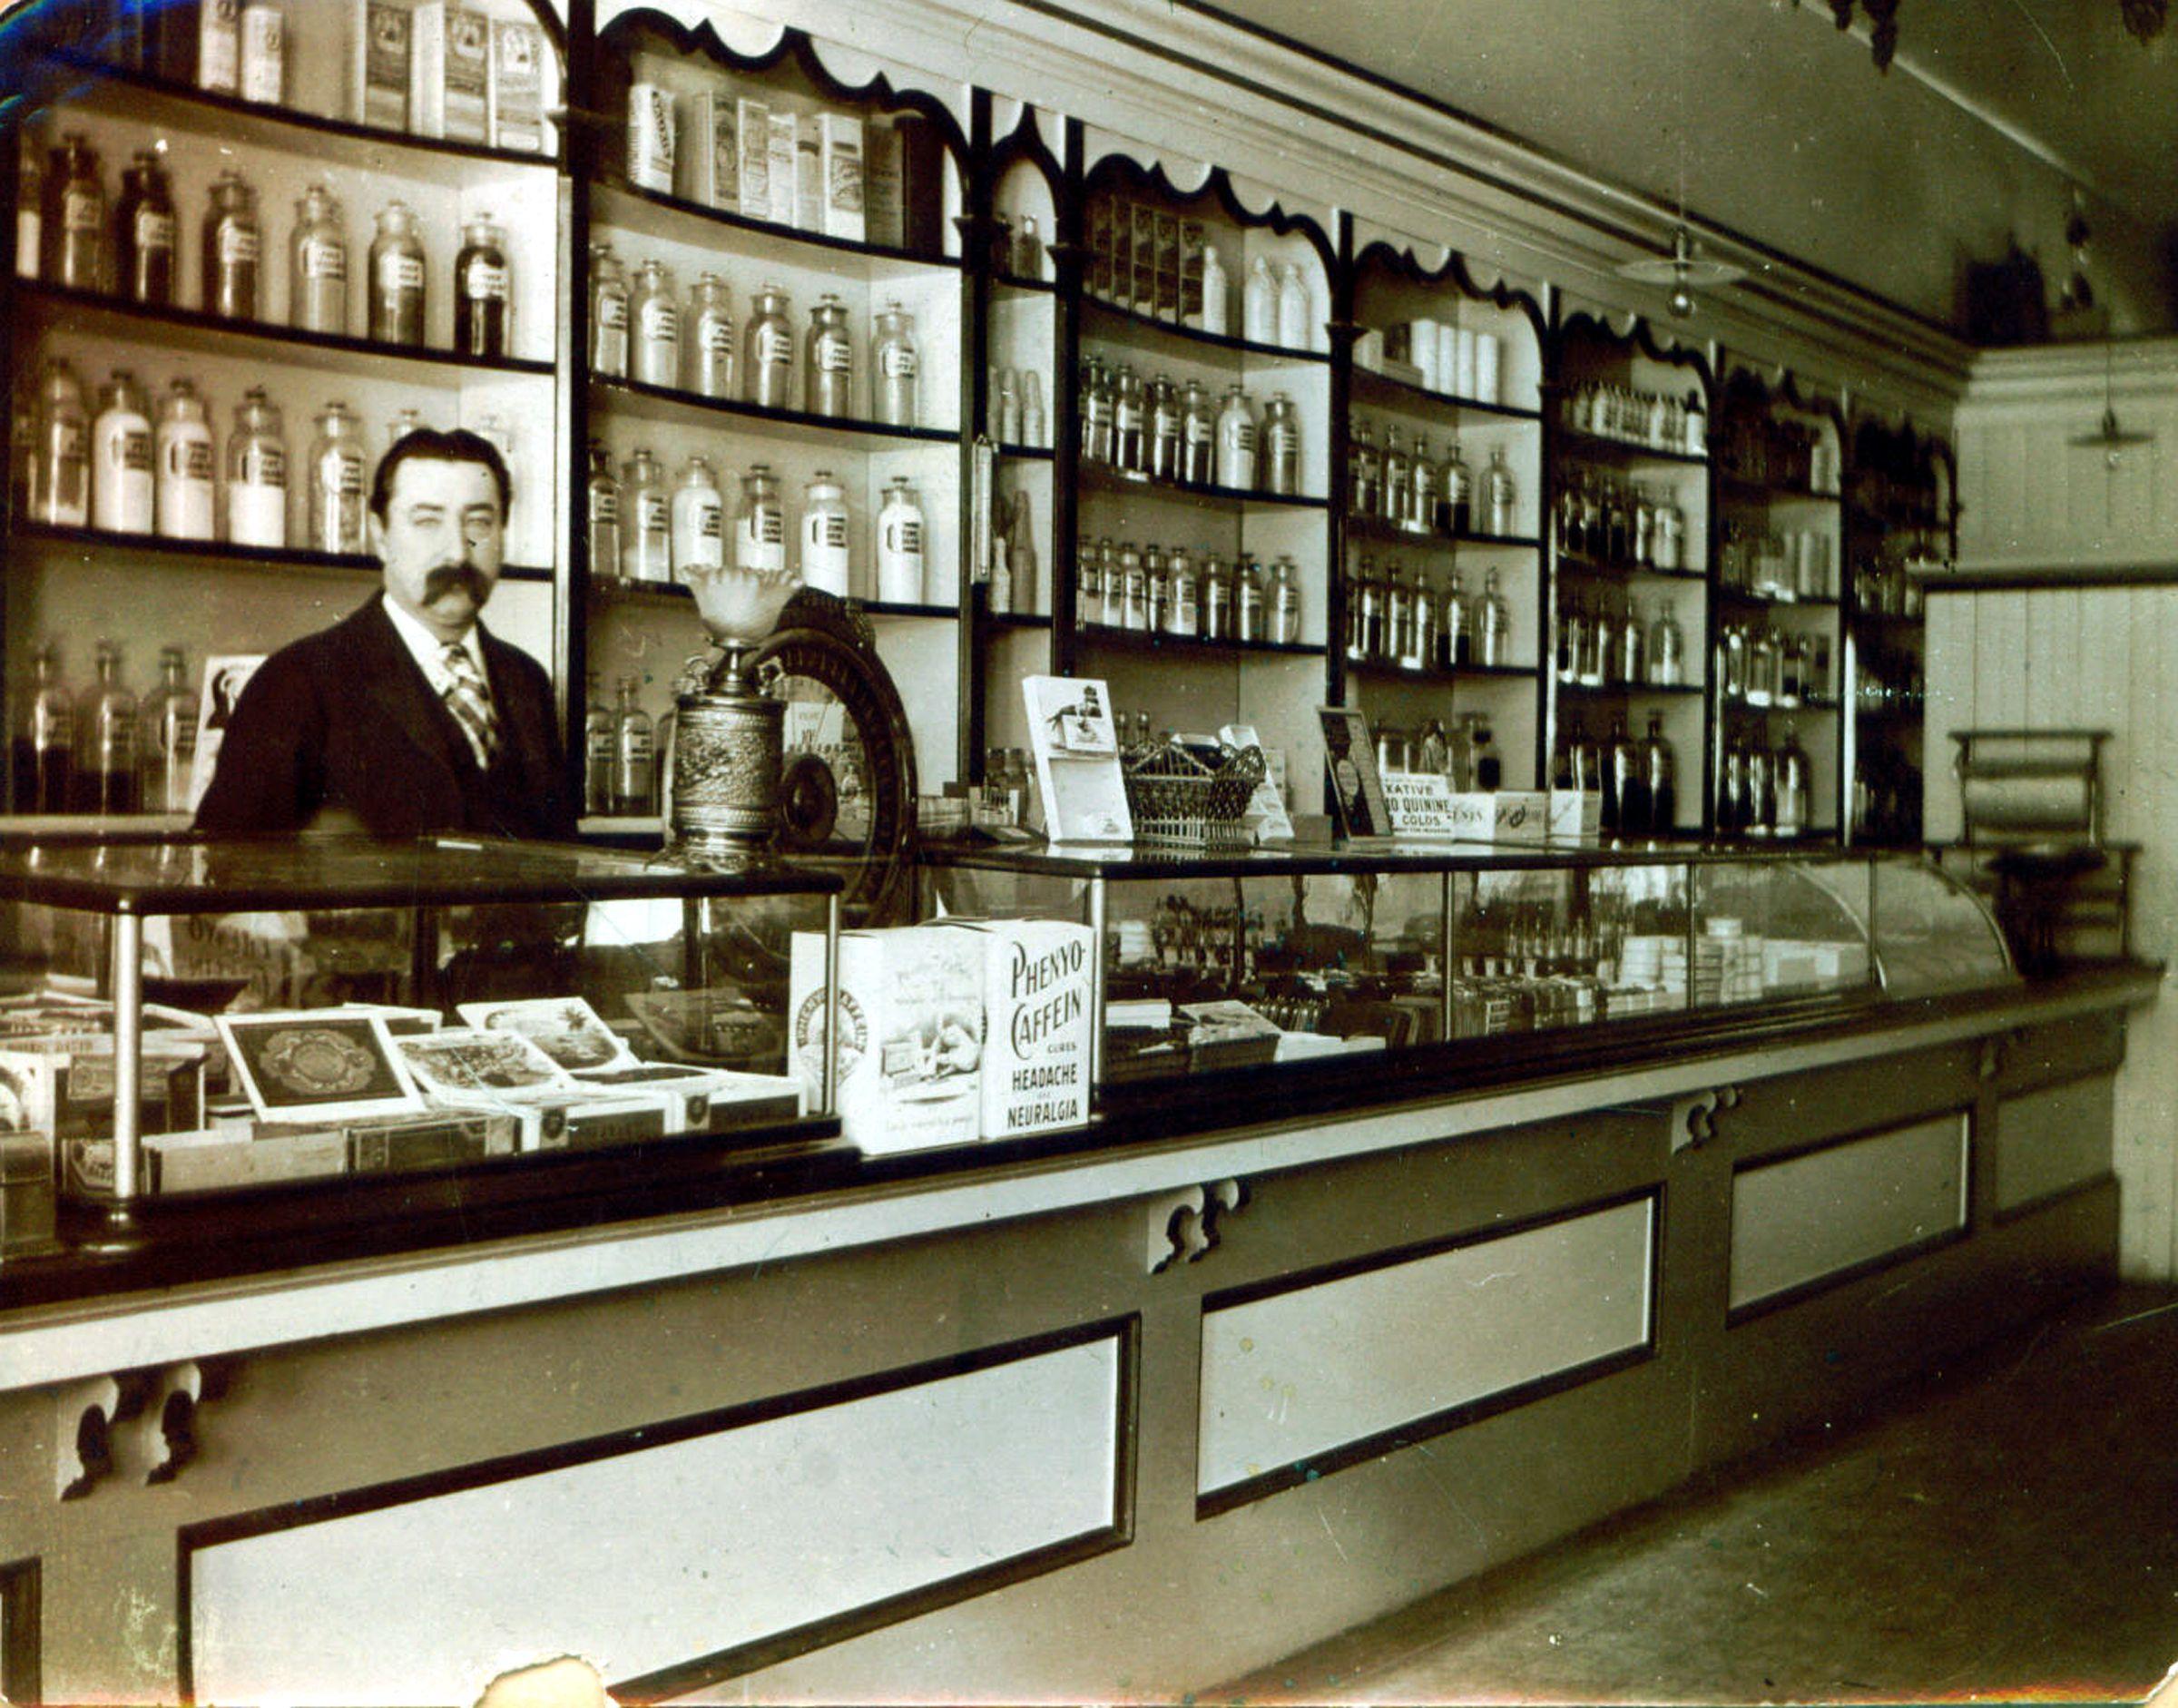 Phrase, vintage pharmacy photographs theme